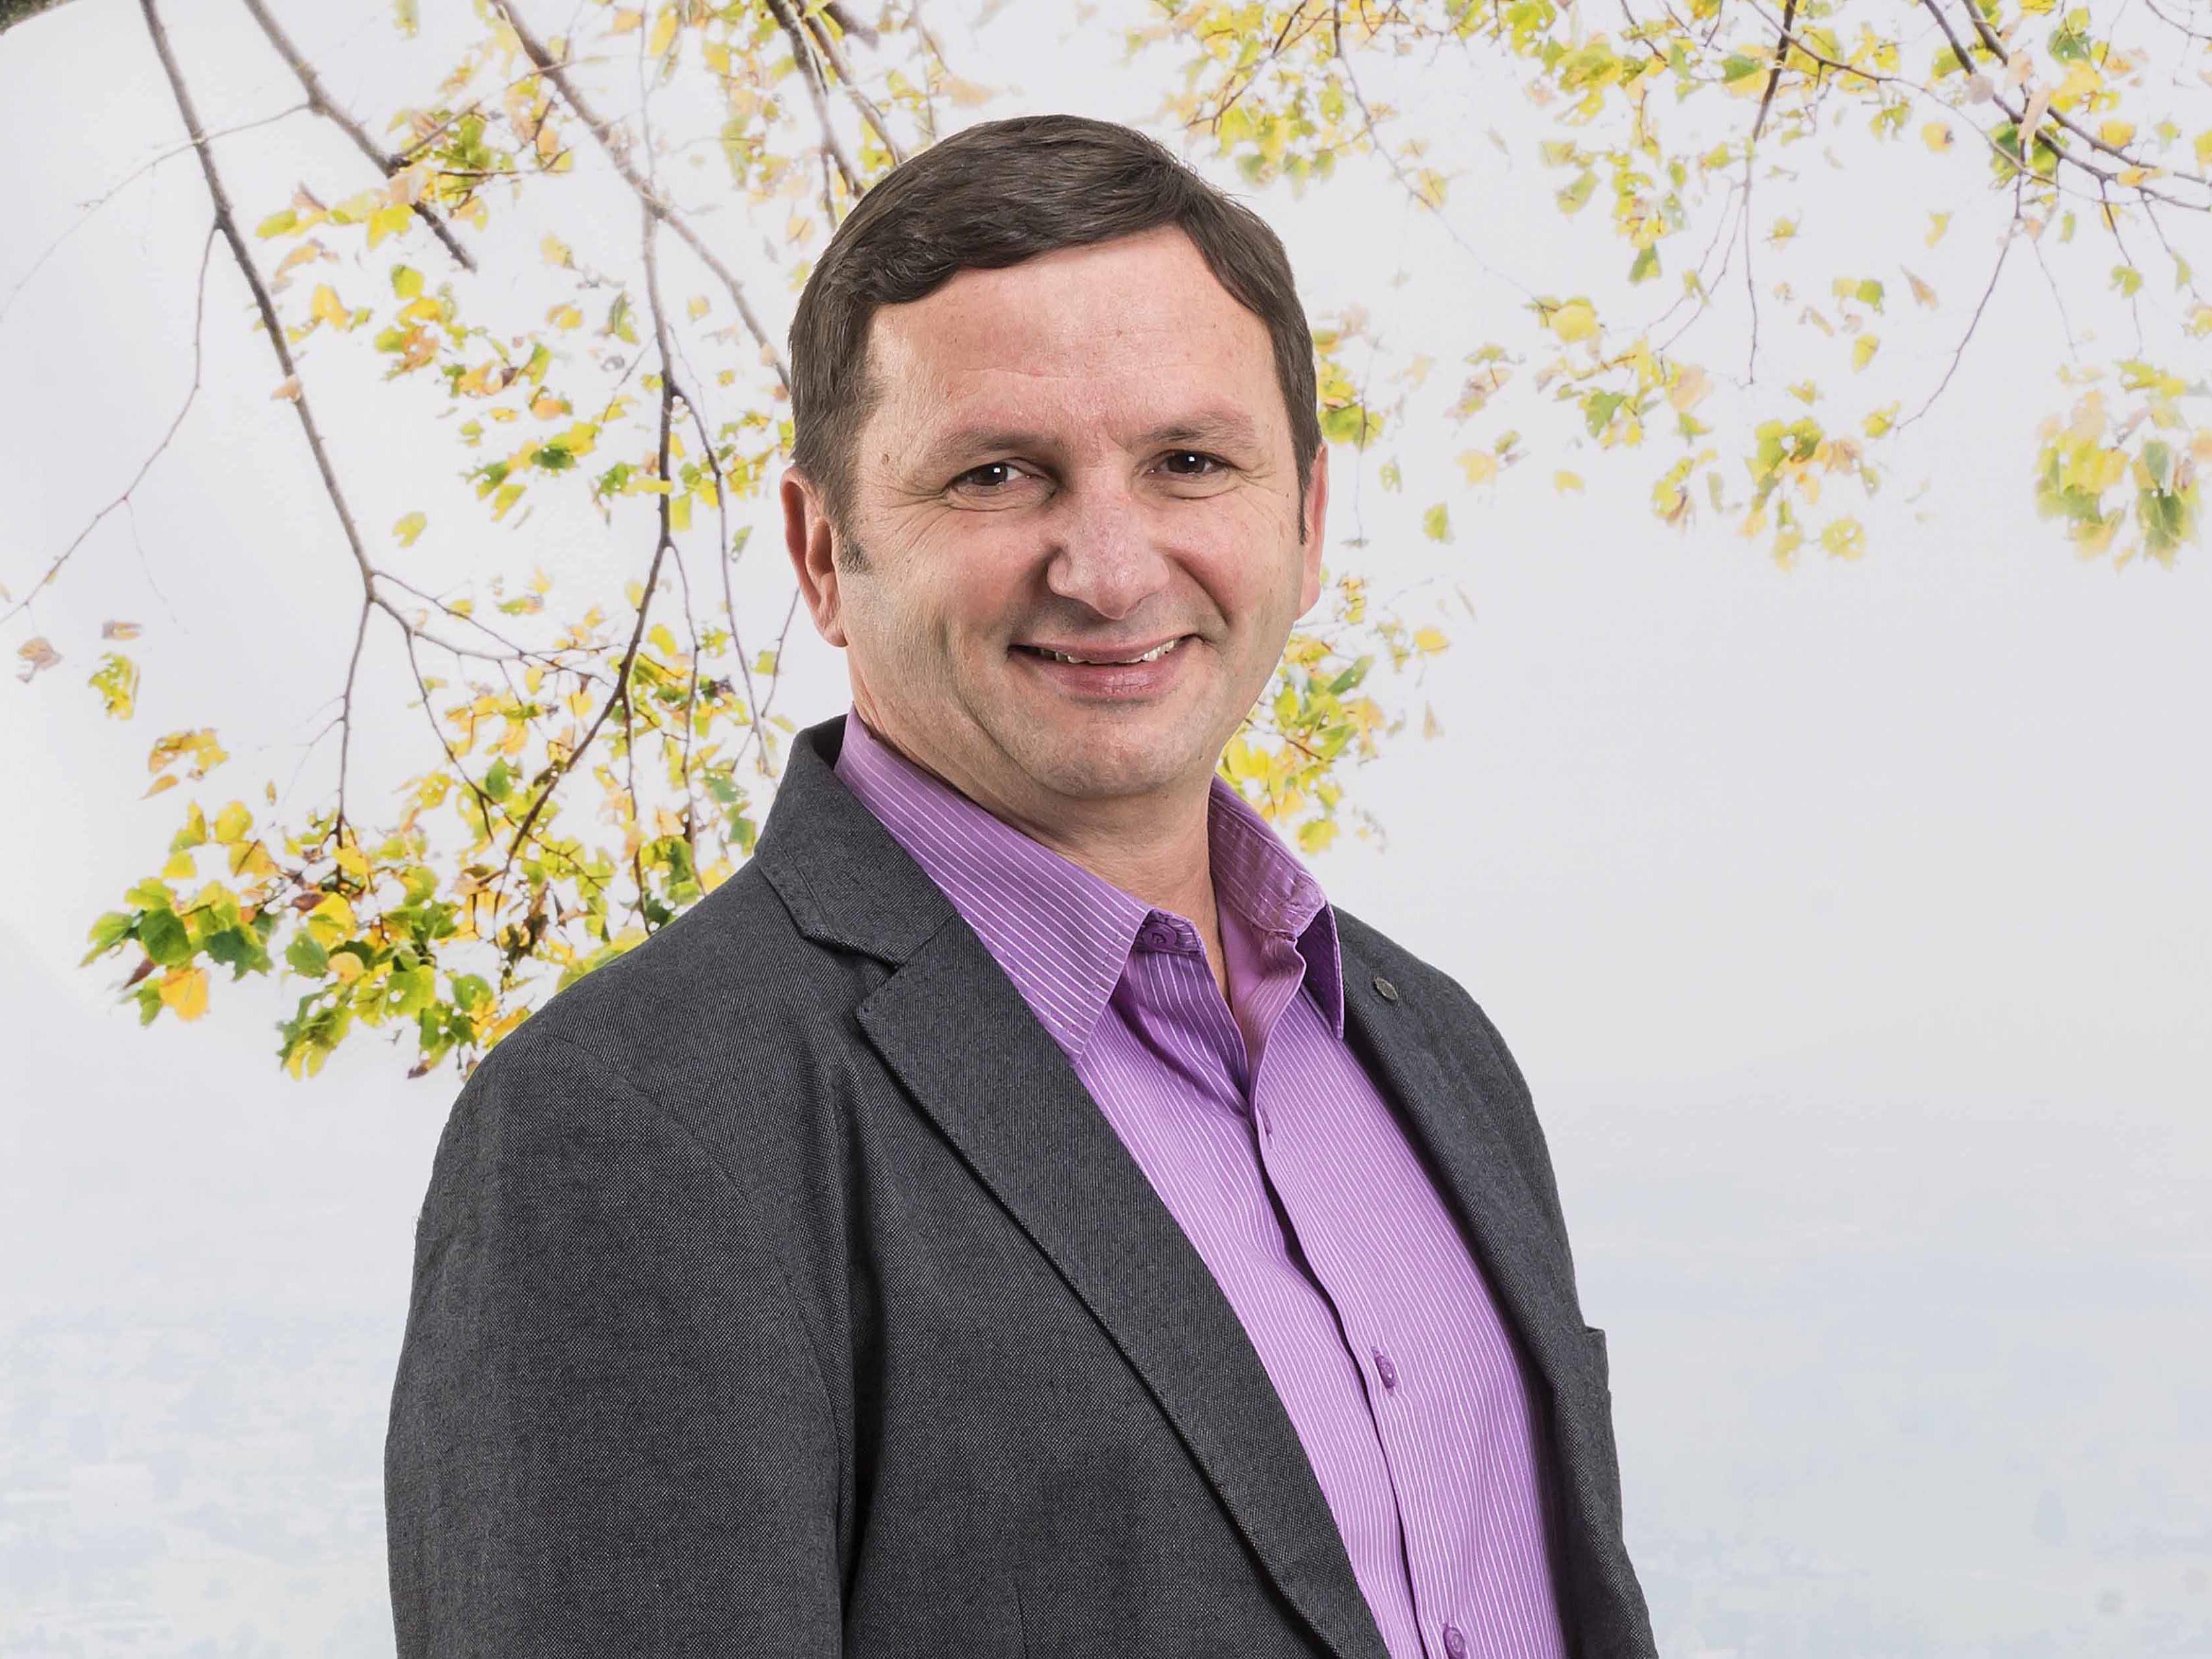 Willi Witzemann informiert über Altacher Jugendtaxi ab 1.1.2017.